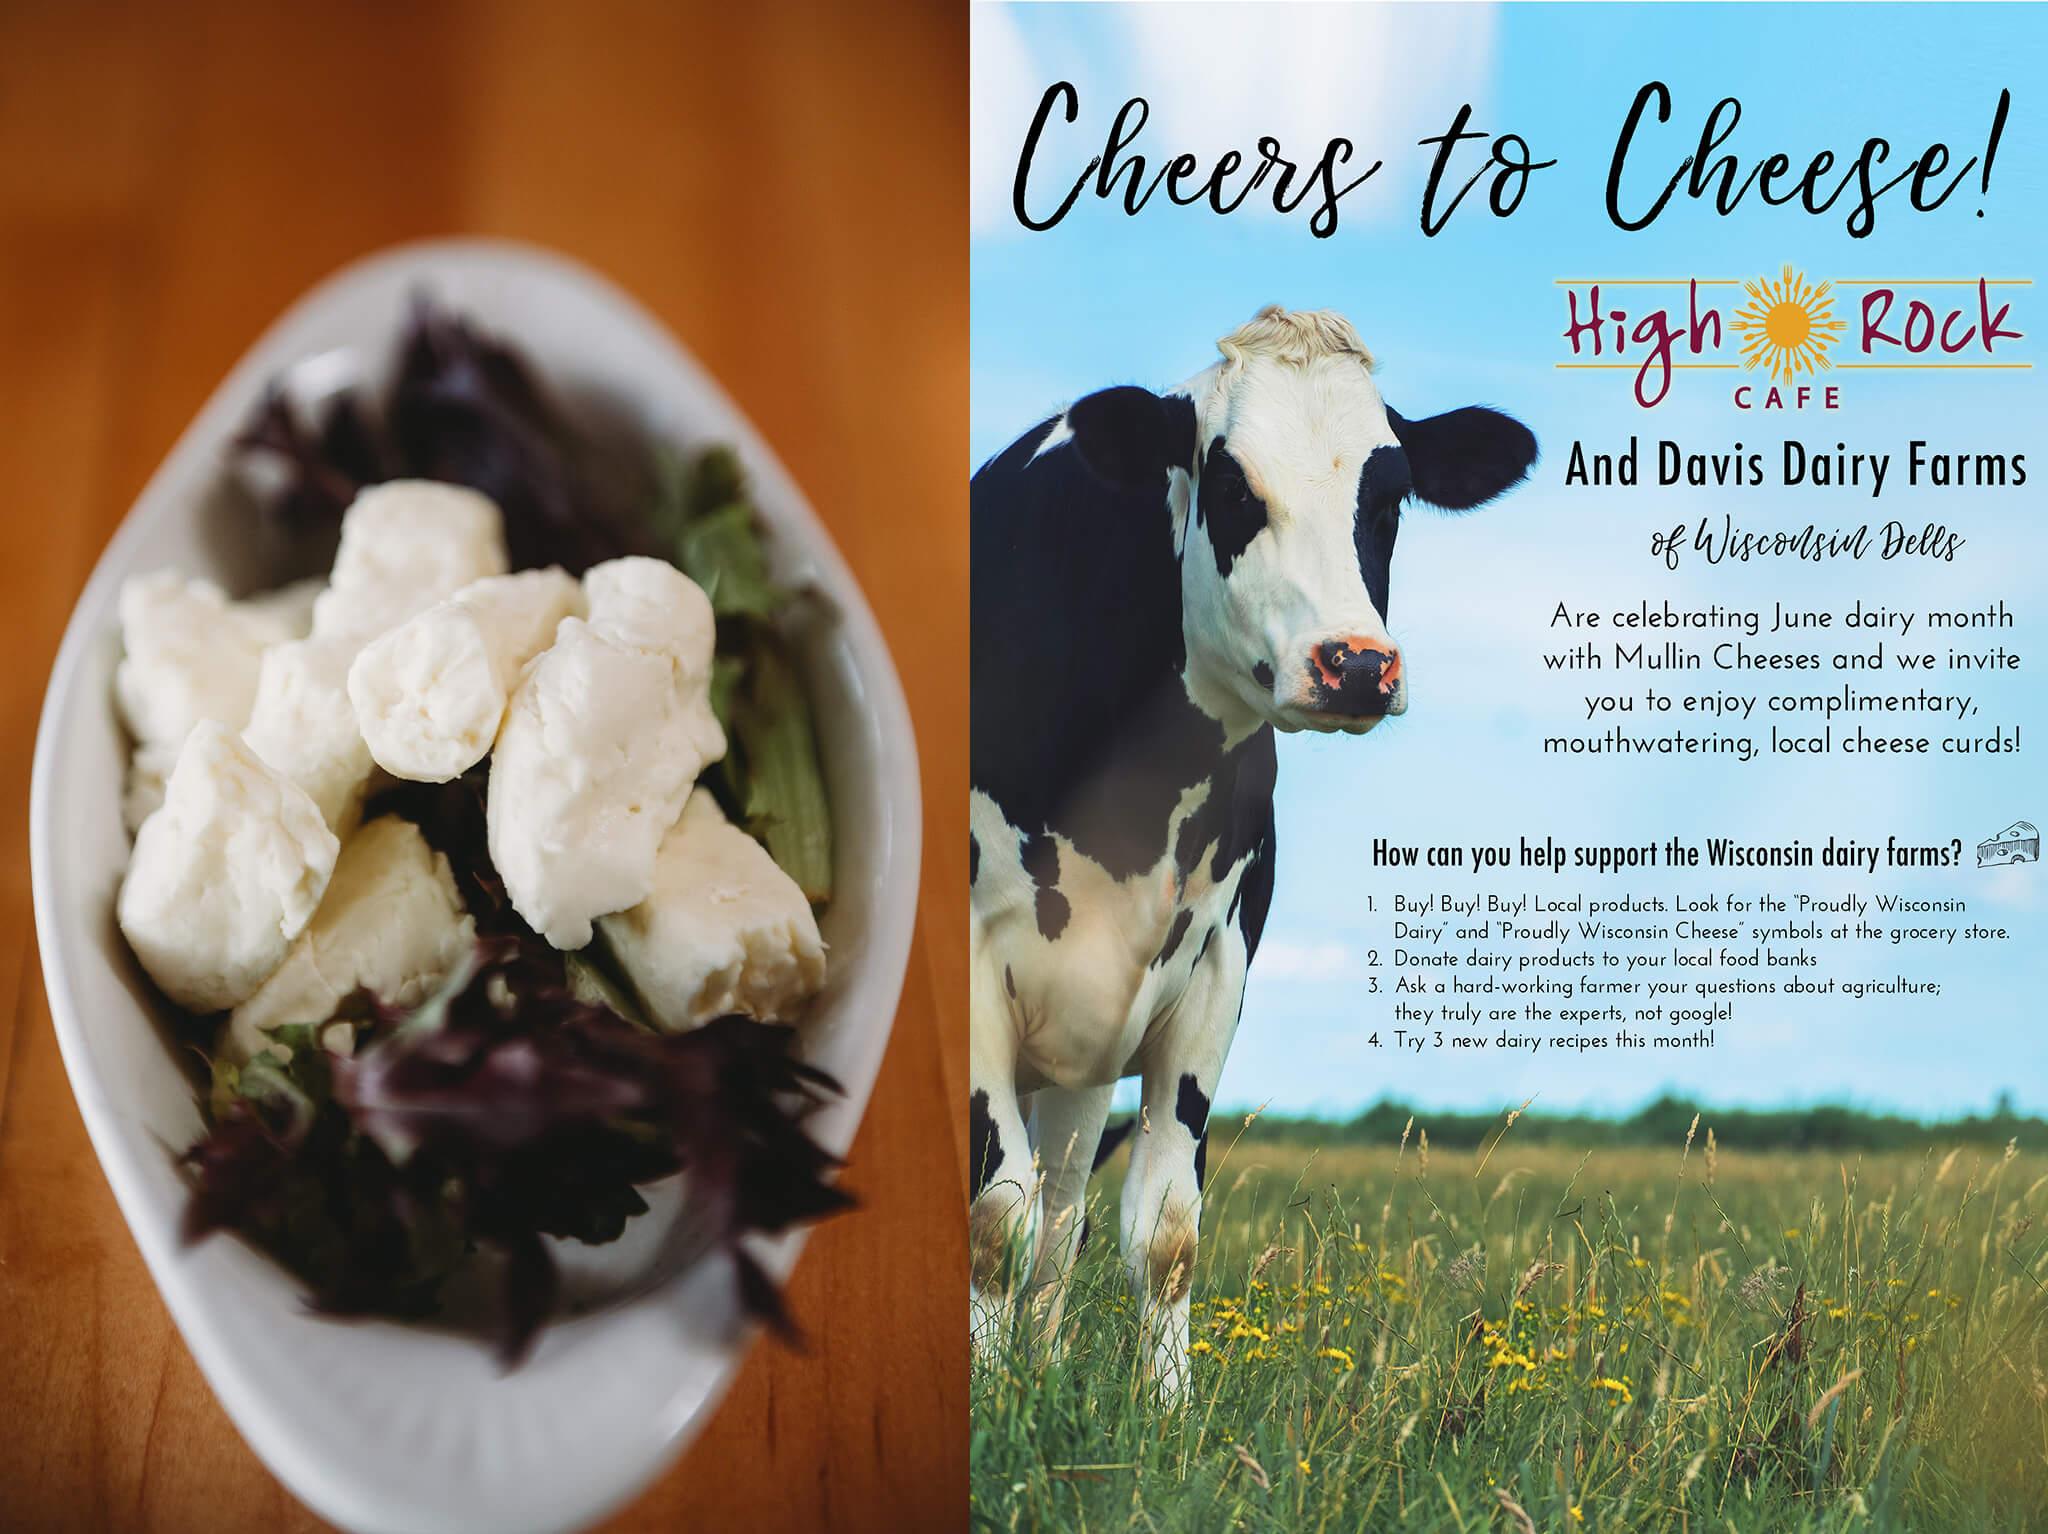 Celebrating June Dairy Month at High Rock Cafe! - High Rock Cafe